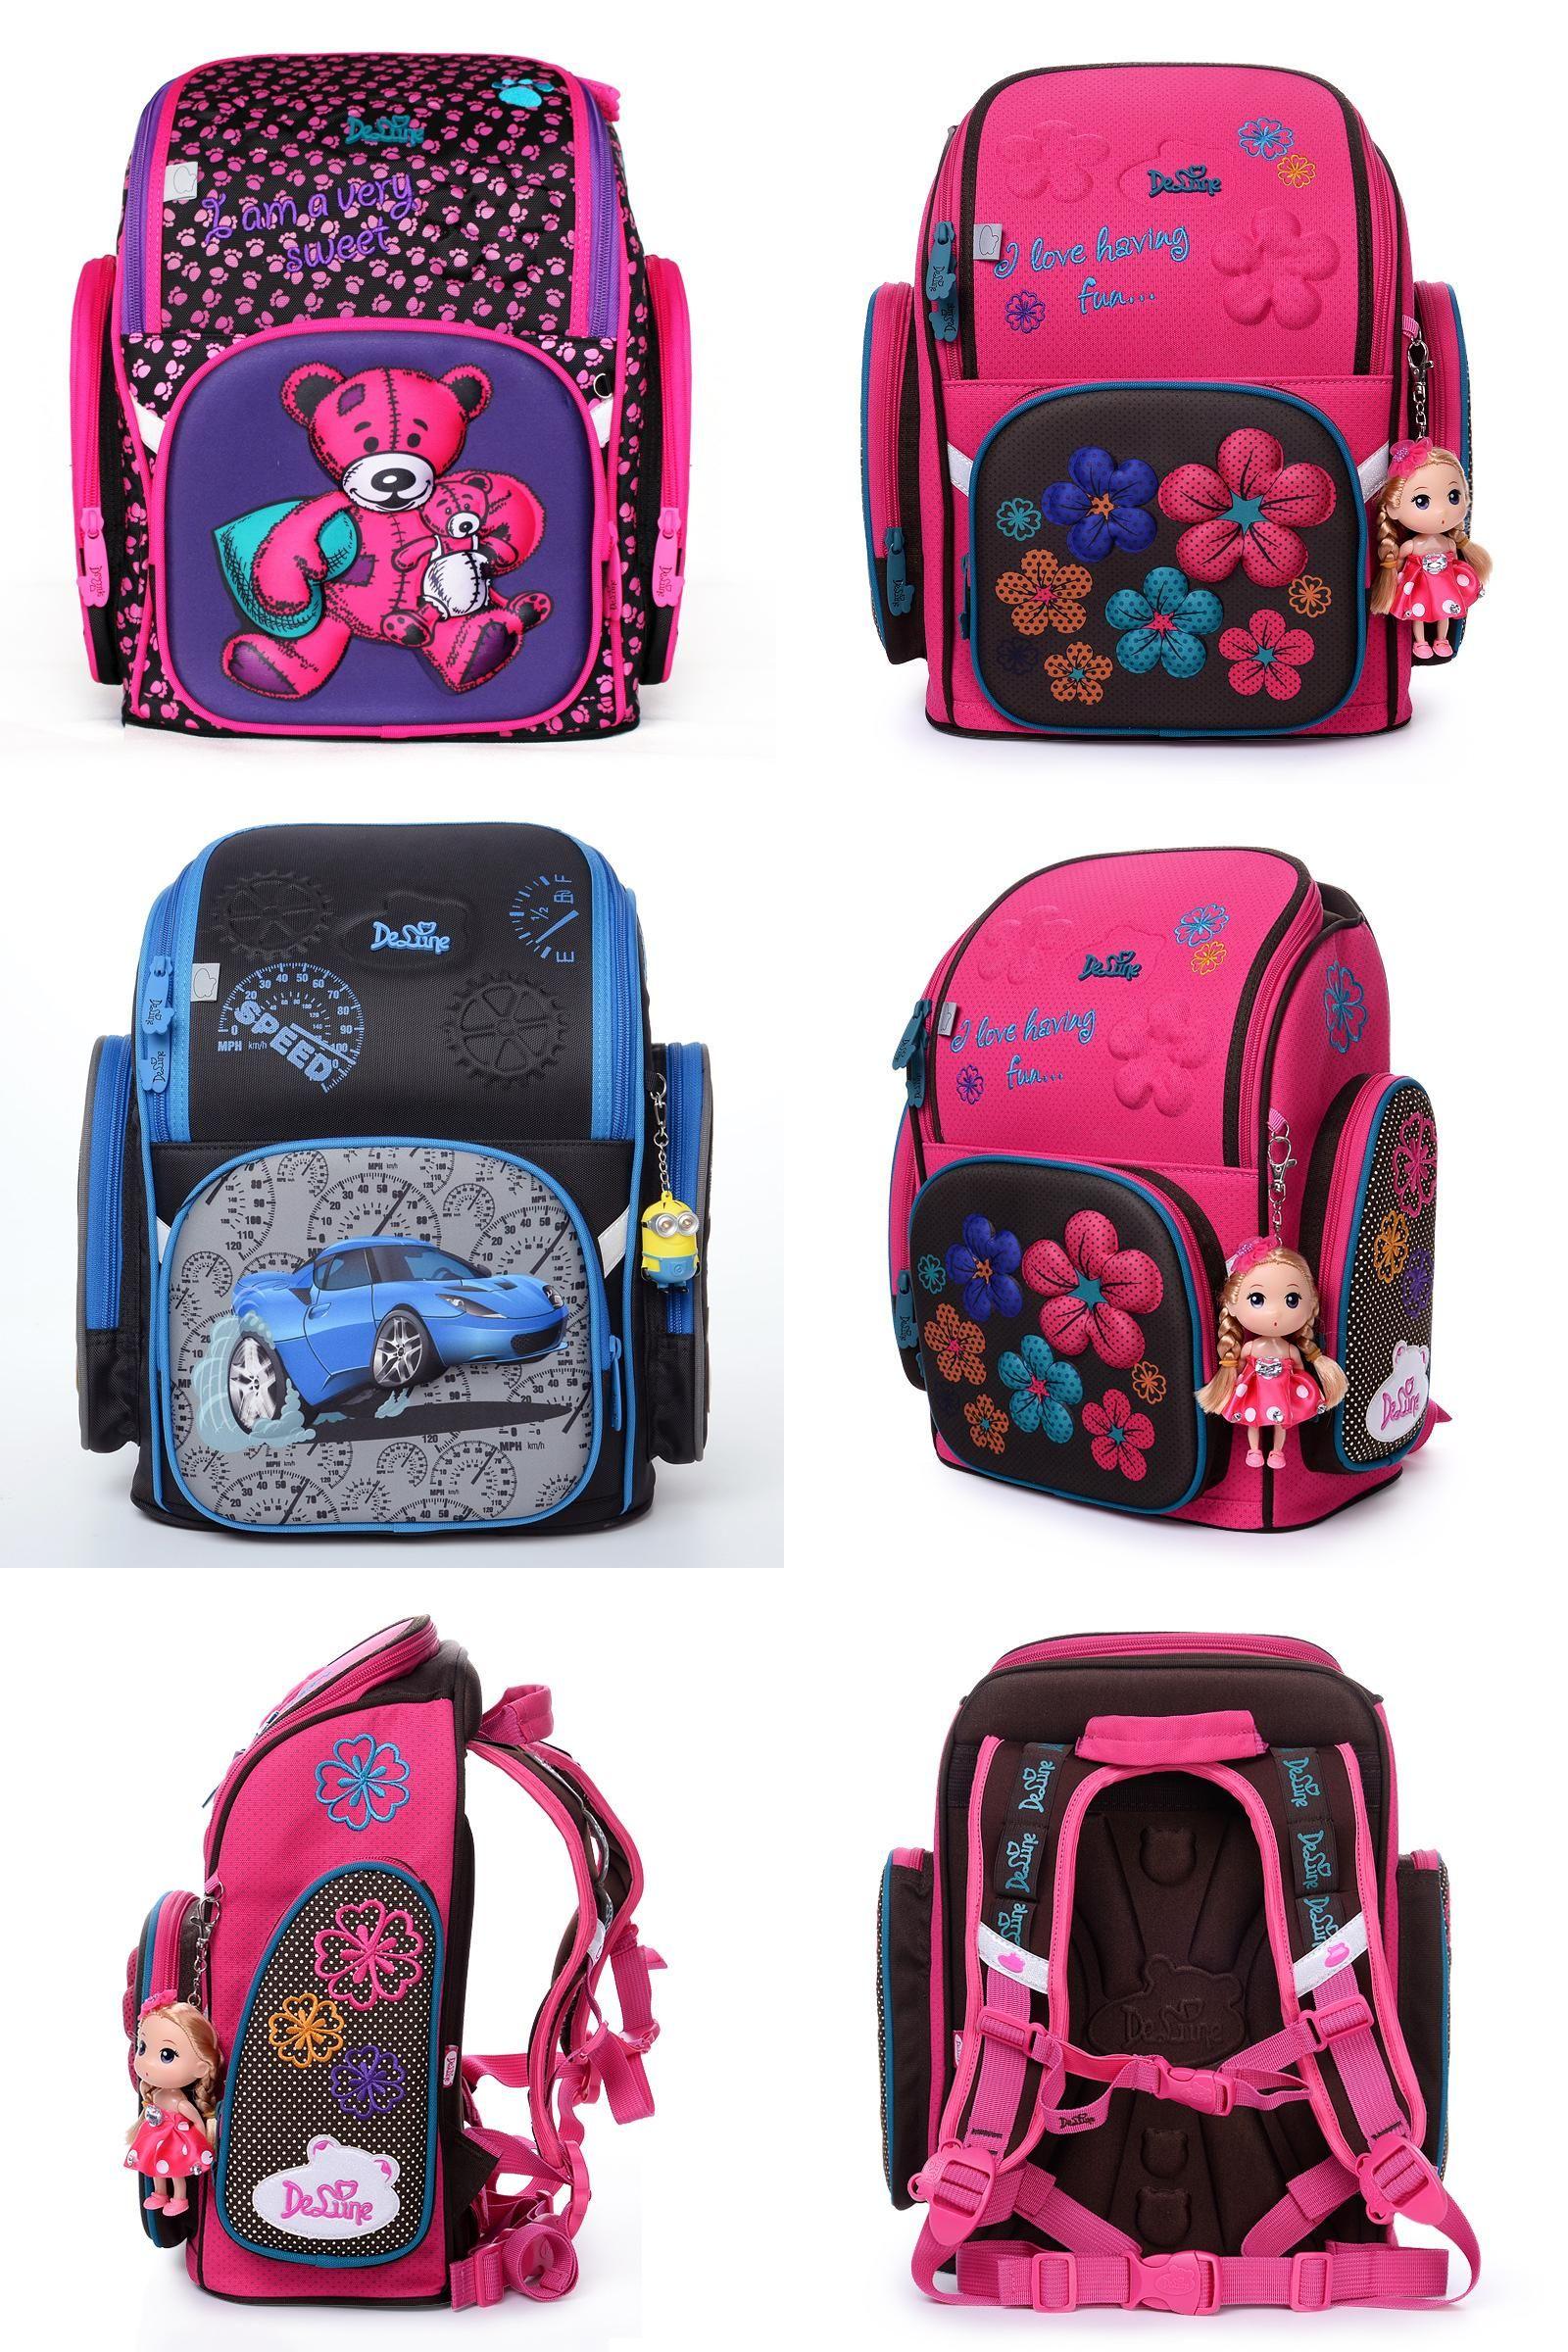 [Visit to Buy] 2017 Factory delune brand kids school bag